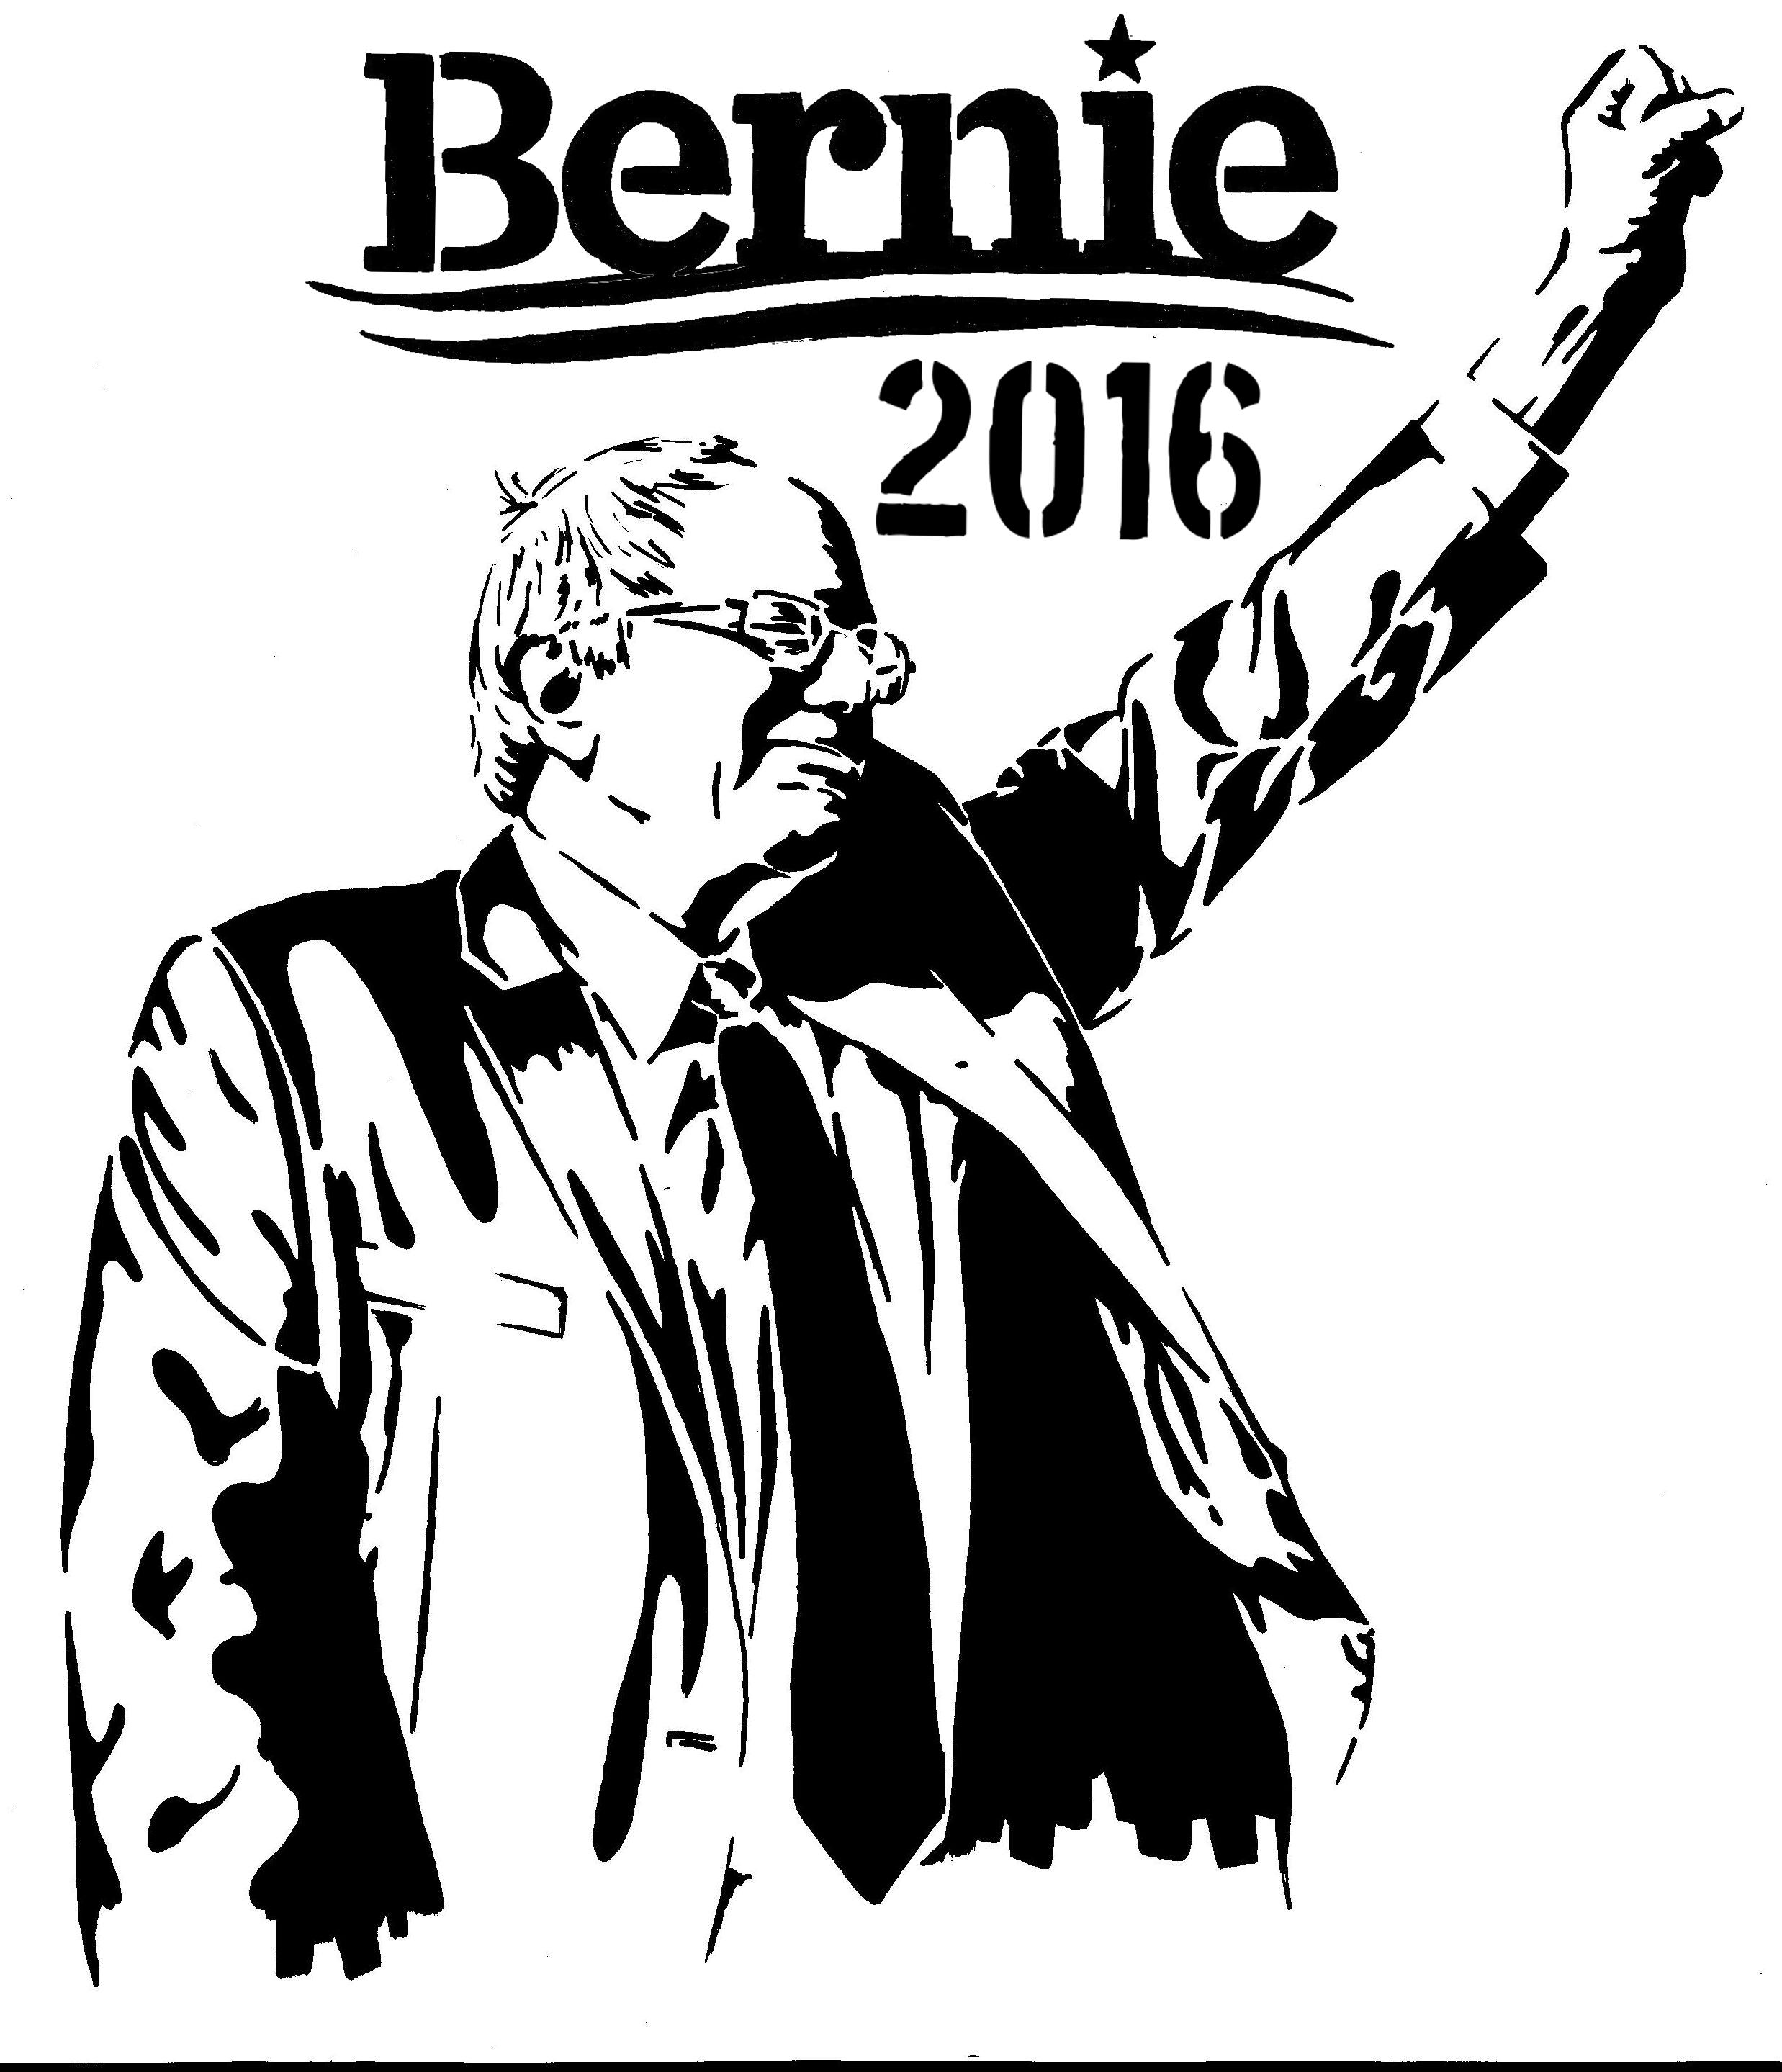 Stencils for Bernie